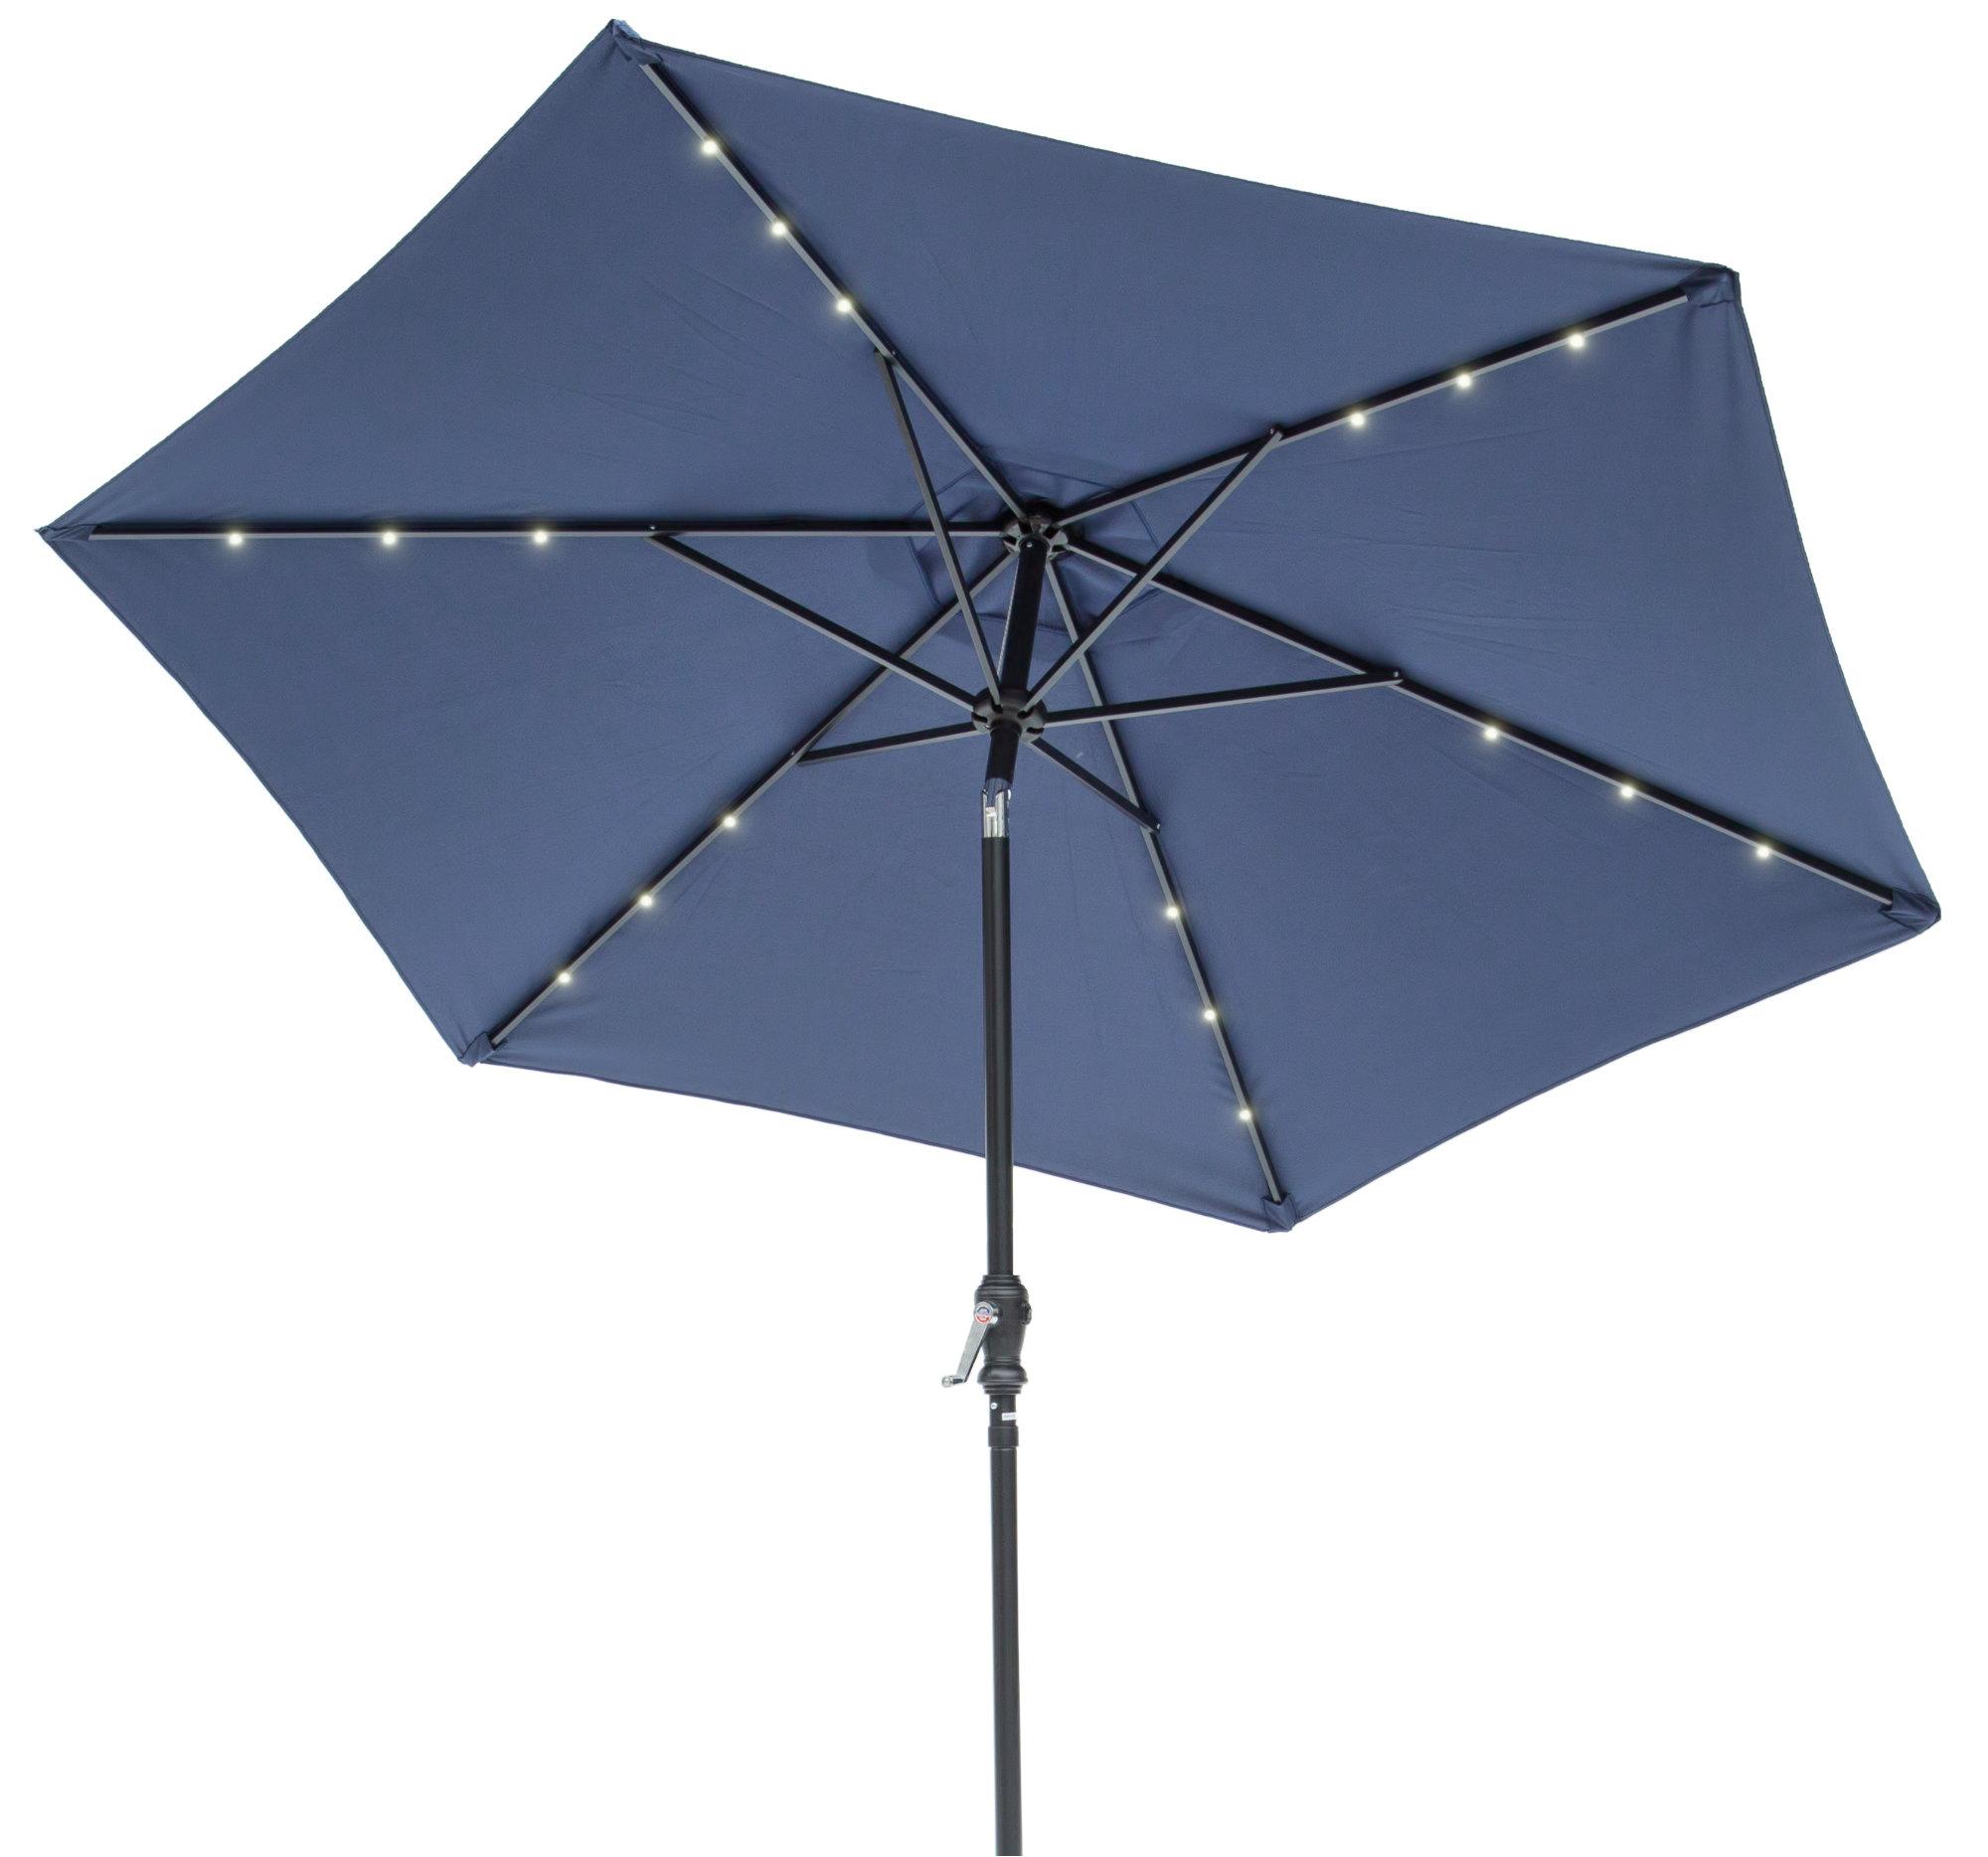 Herlinda Solar Lighted 9' Market Umbrella Intended For Trendy Hawkinge Market Umbrellas (View 10 of 20)